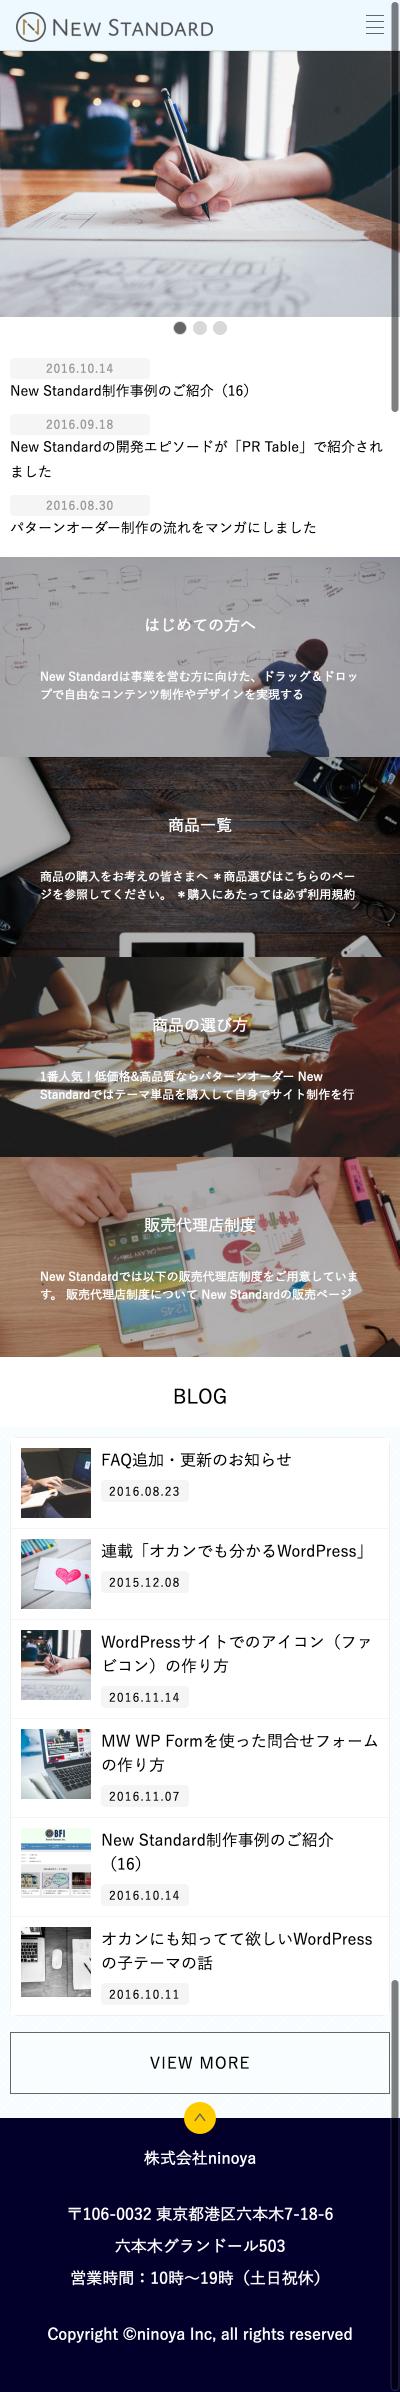 screenshot-v2-newstd-net-2016-11-30-17-13-28